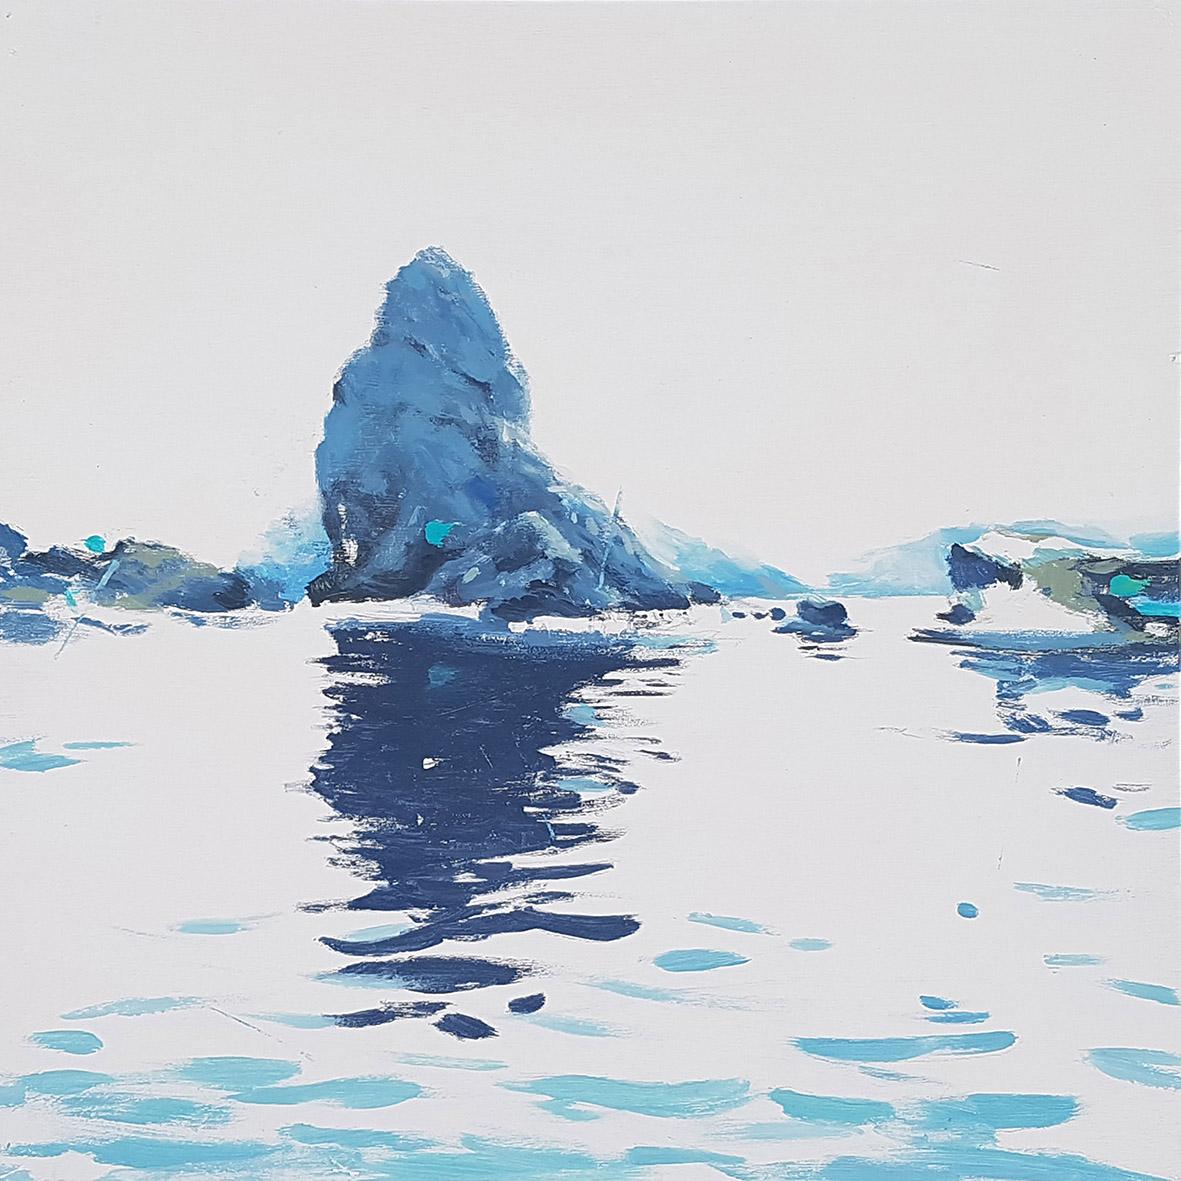 Mediterráneo Serie Els Pallers 3 Javier Barco 50 x50 cm